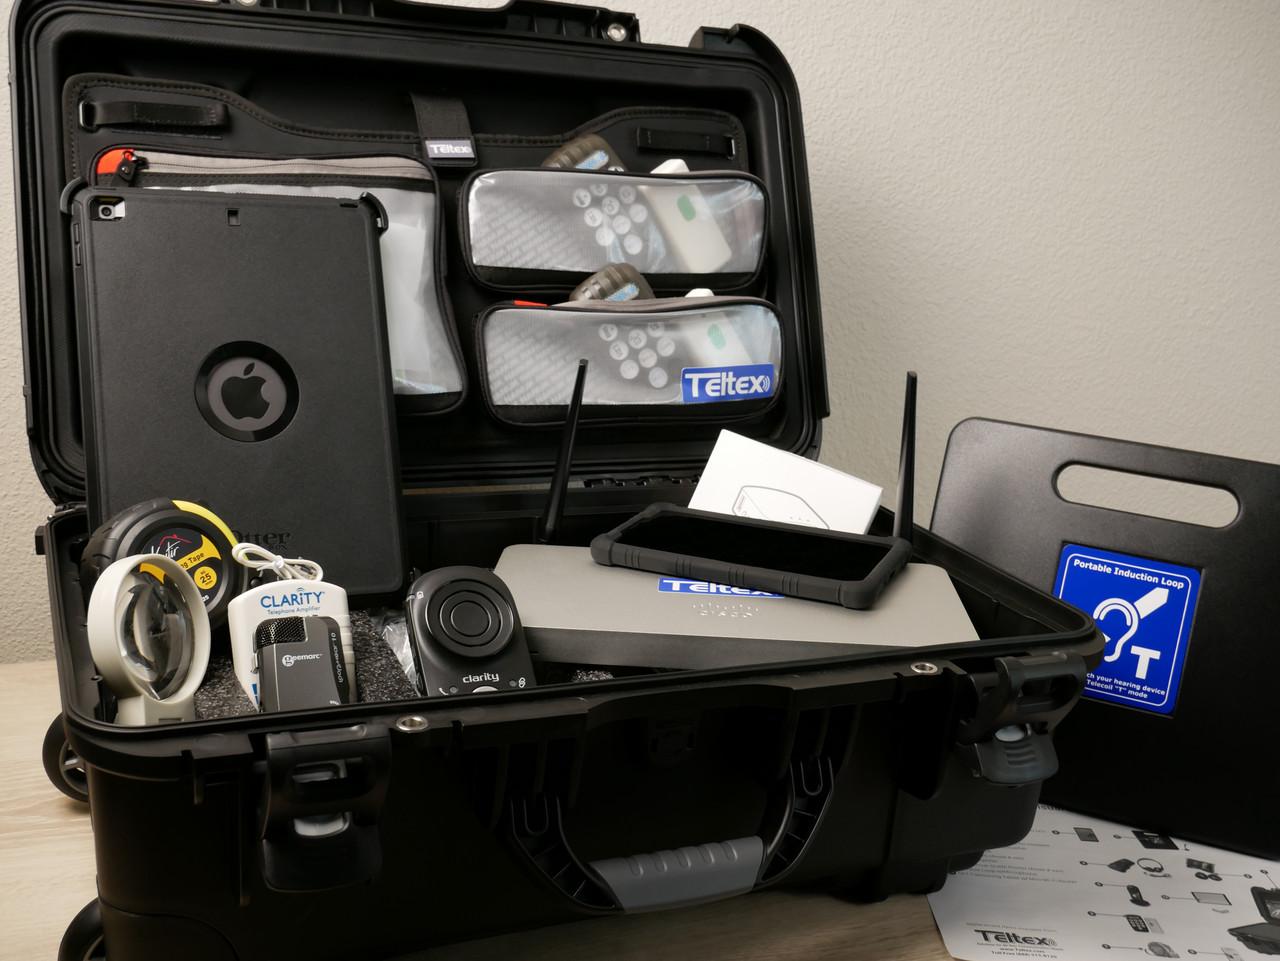 Emergency Communications Kit - Open, Unpacked